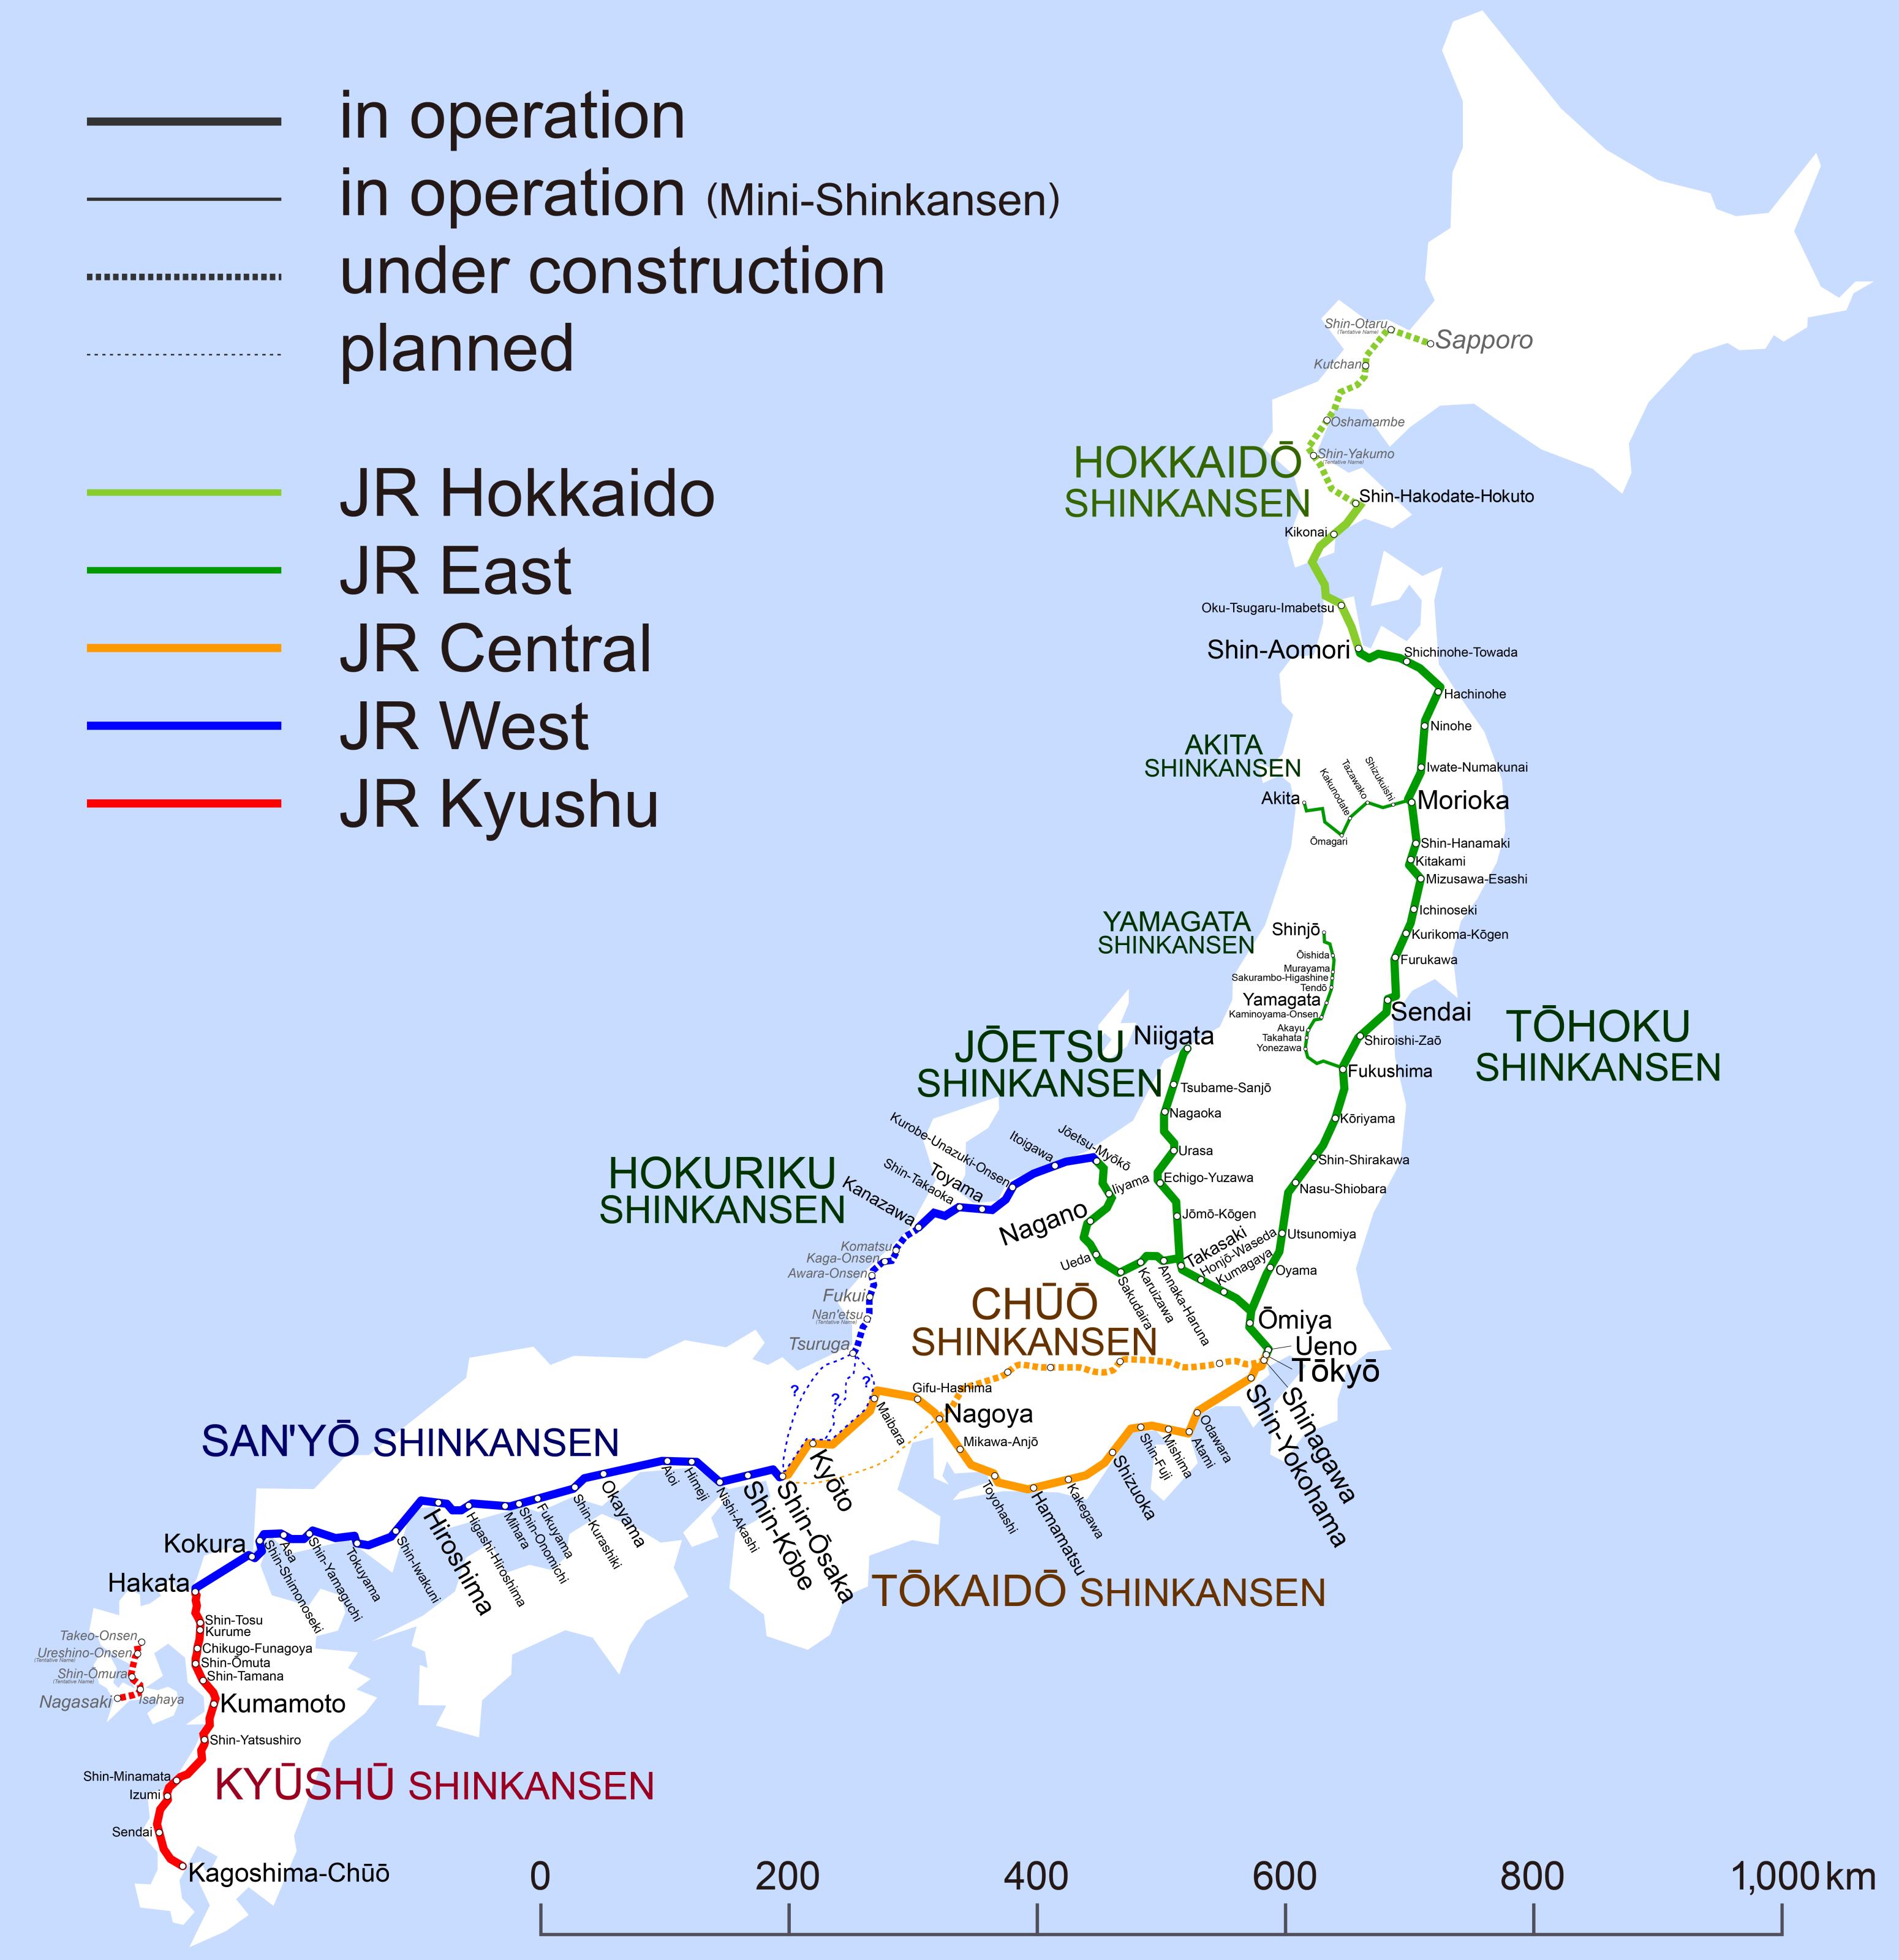 201603: File:Shinkansen Map 201603 En.png